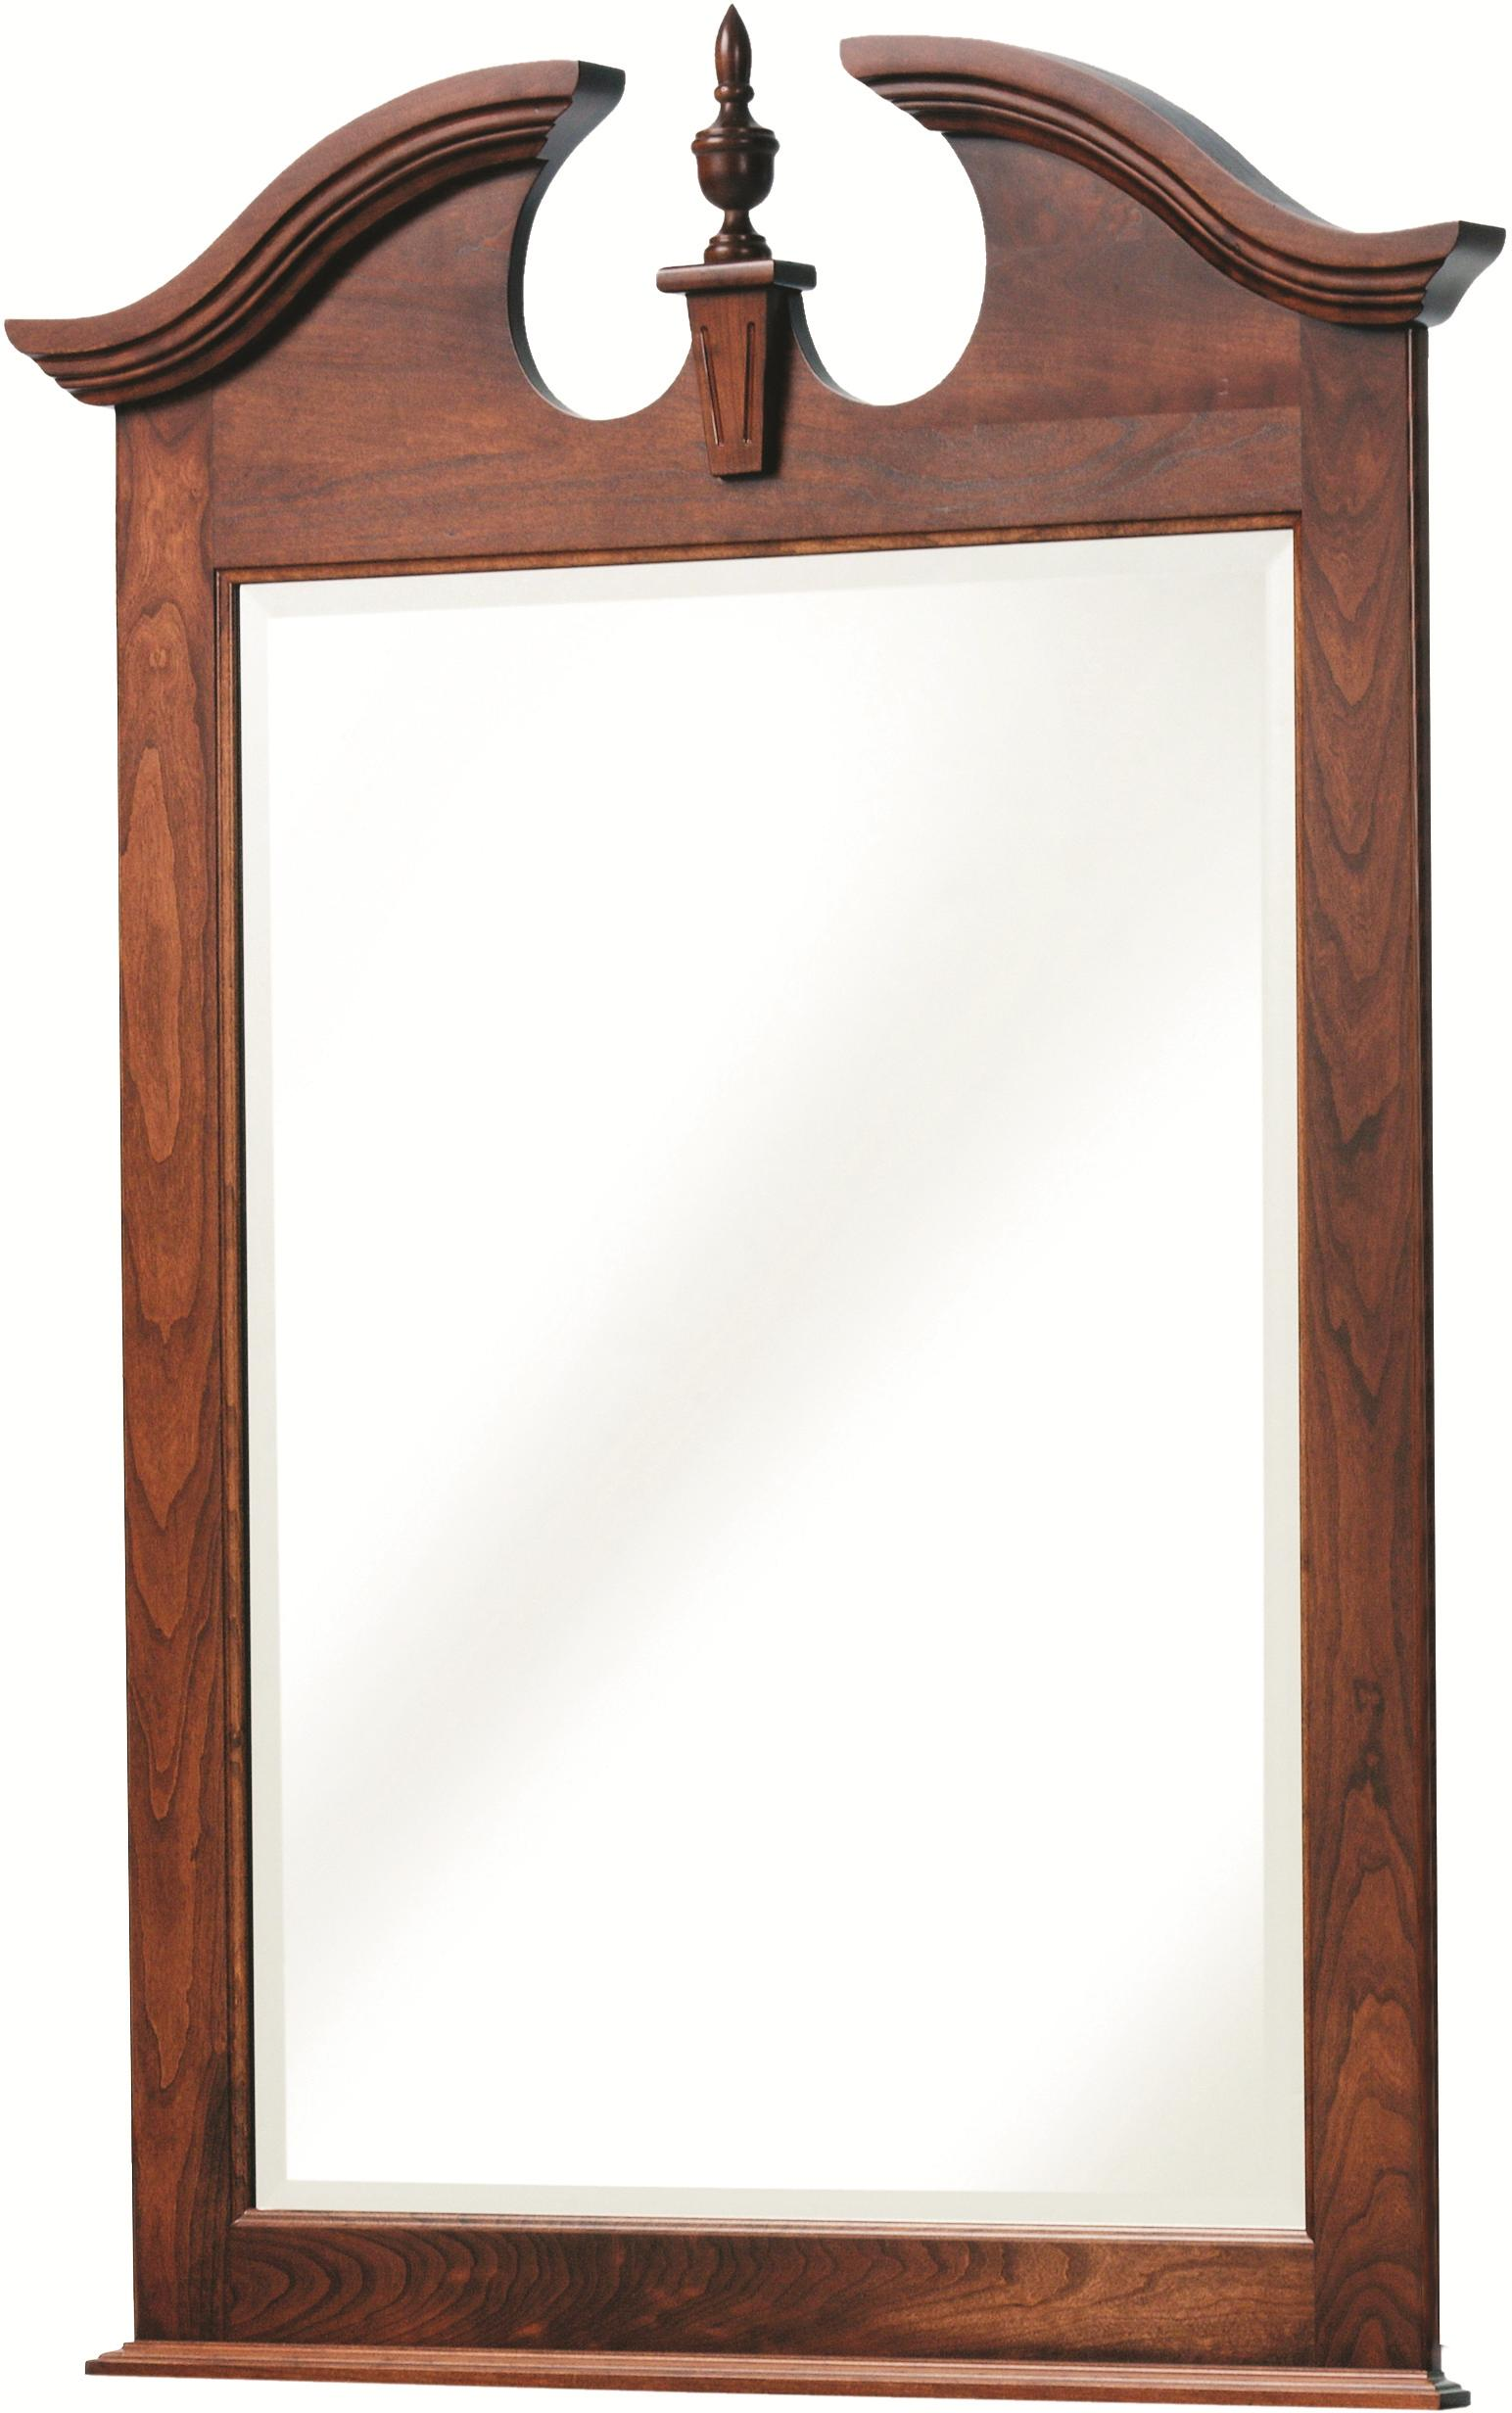 Elegant River Bend Mirror at Williams & Kay